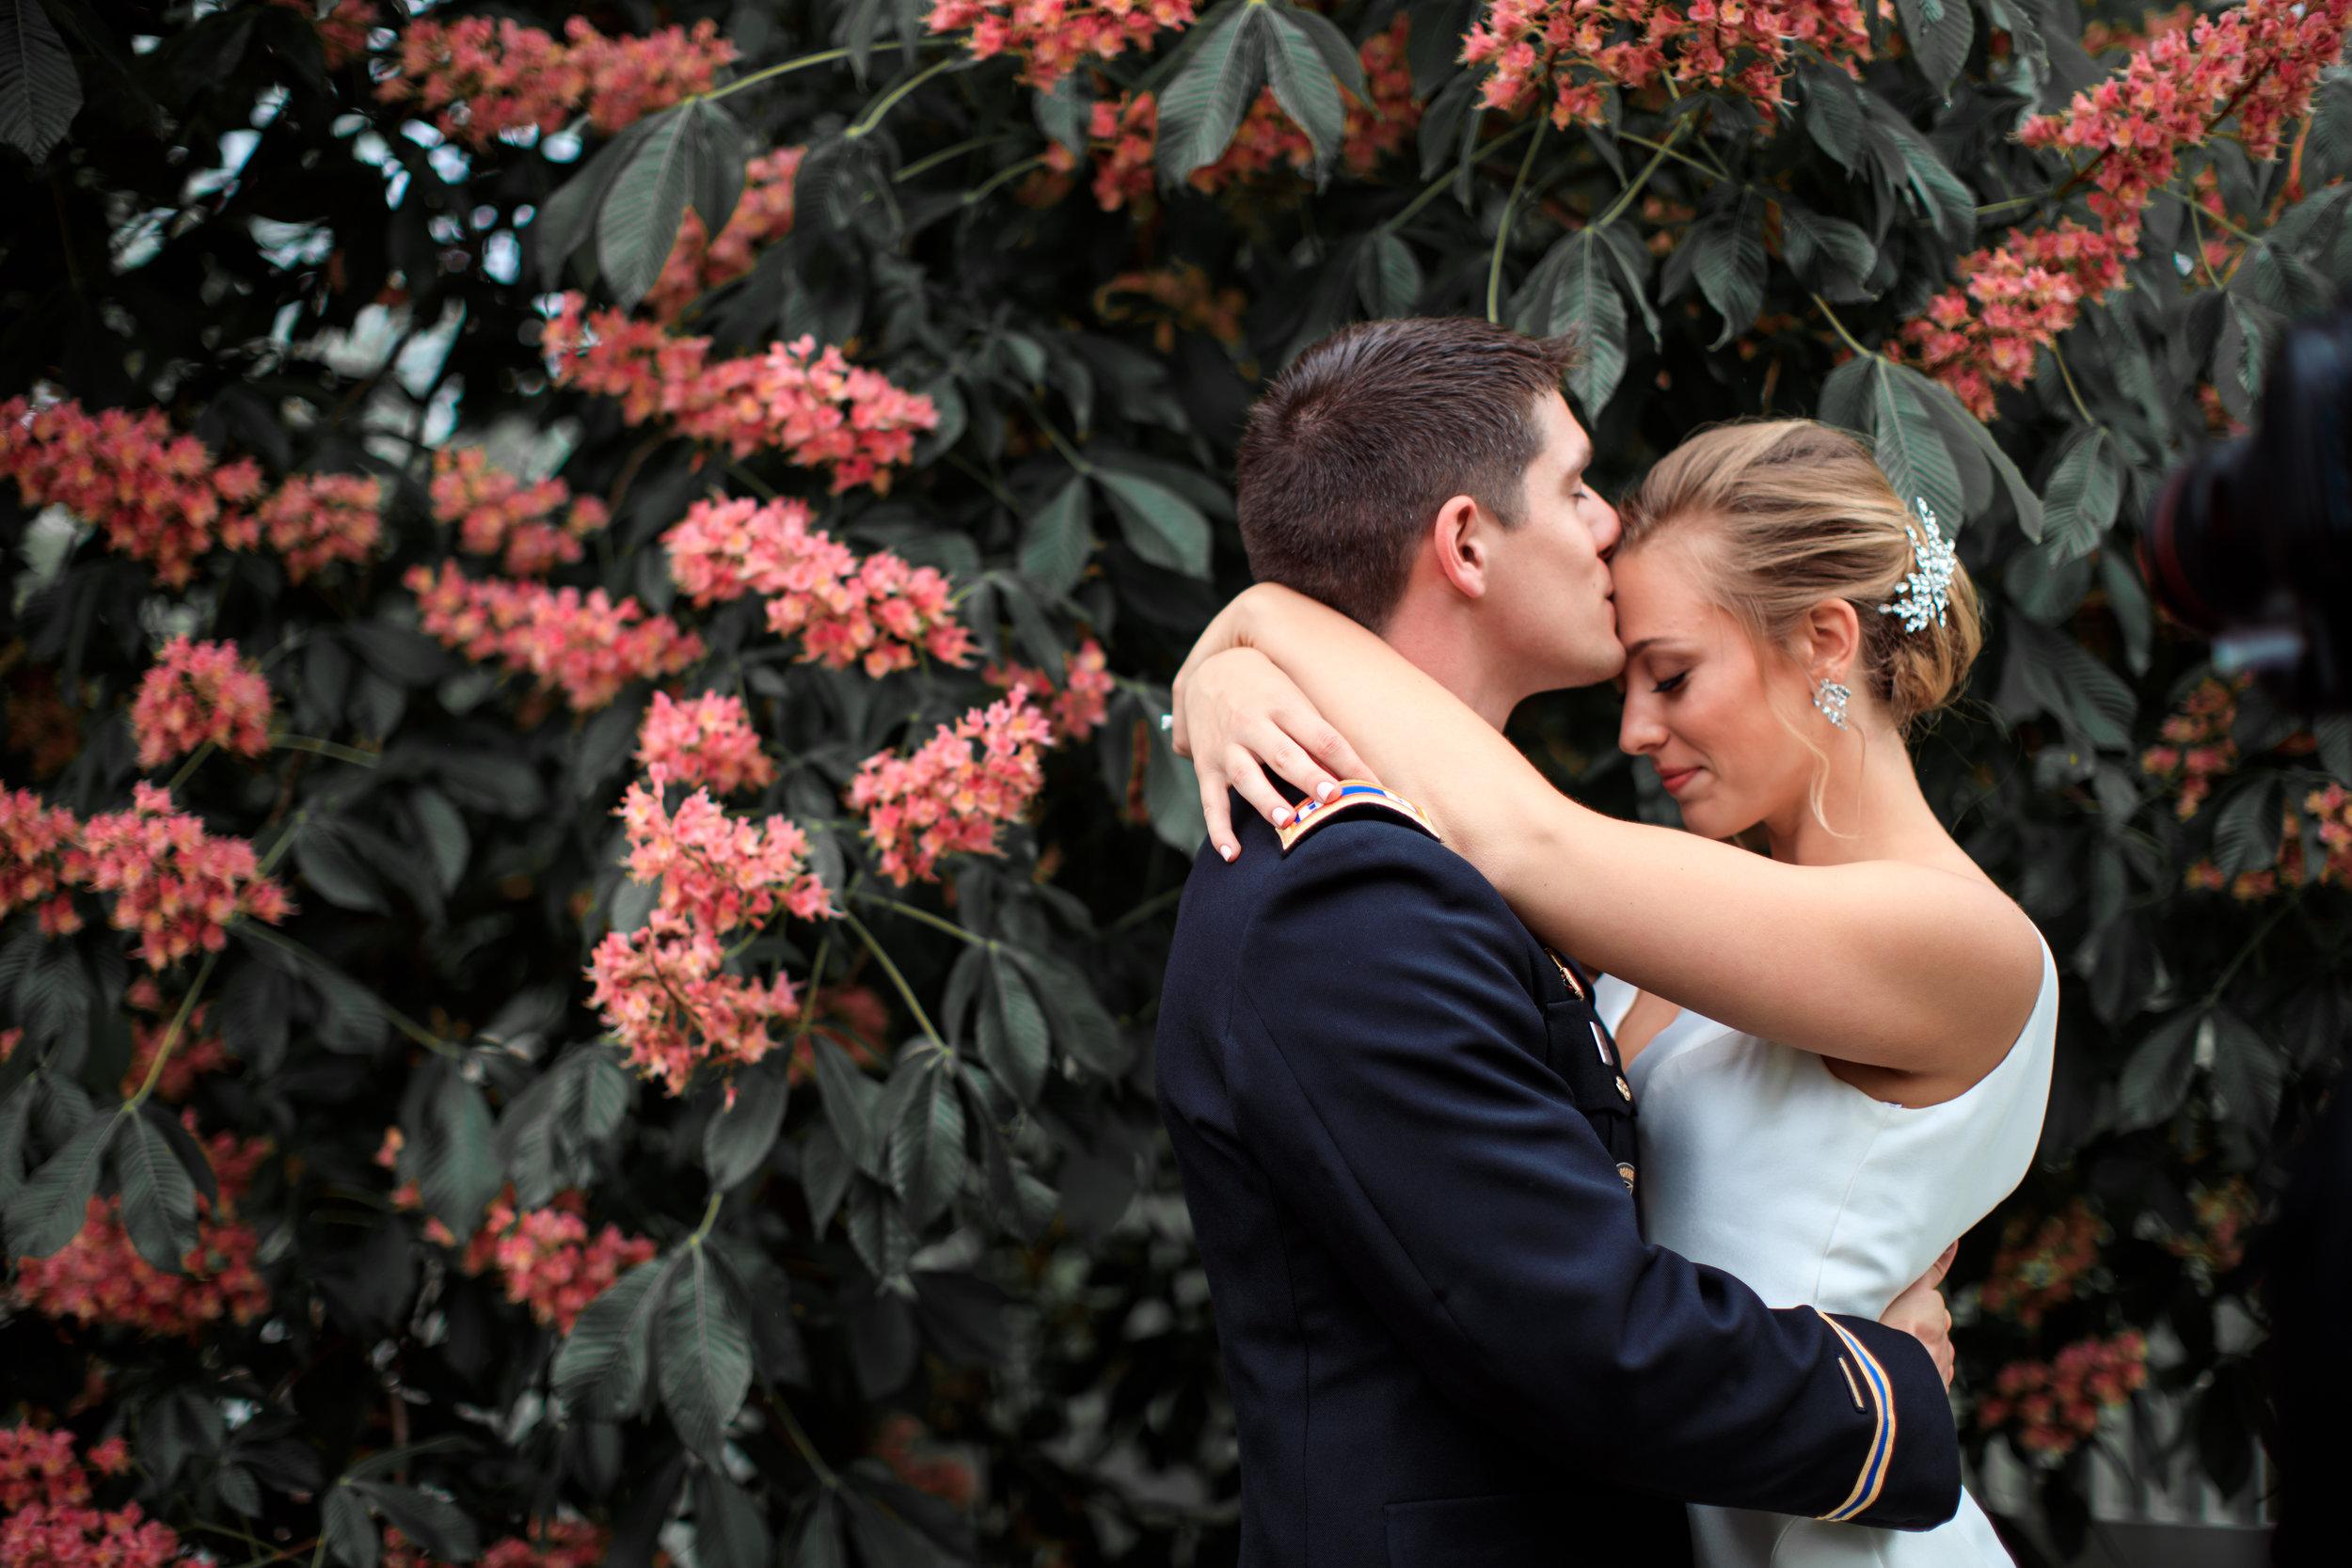 Centennial-Park-Munster-indiana-bride-and-groom-Lauren-ashley-studios-kiss-on-forehead.jpg